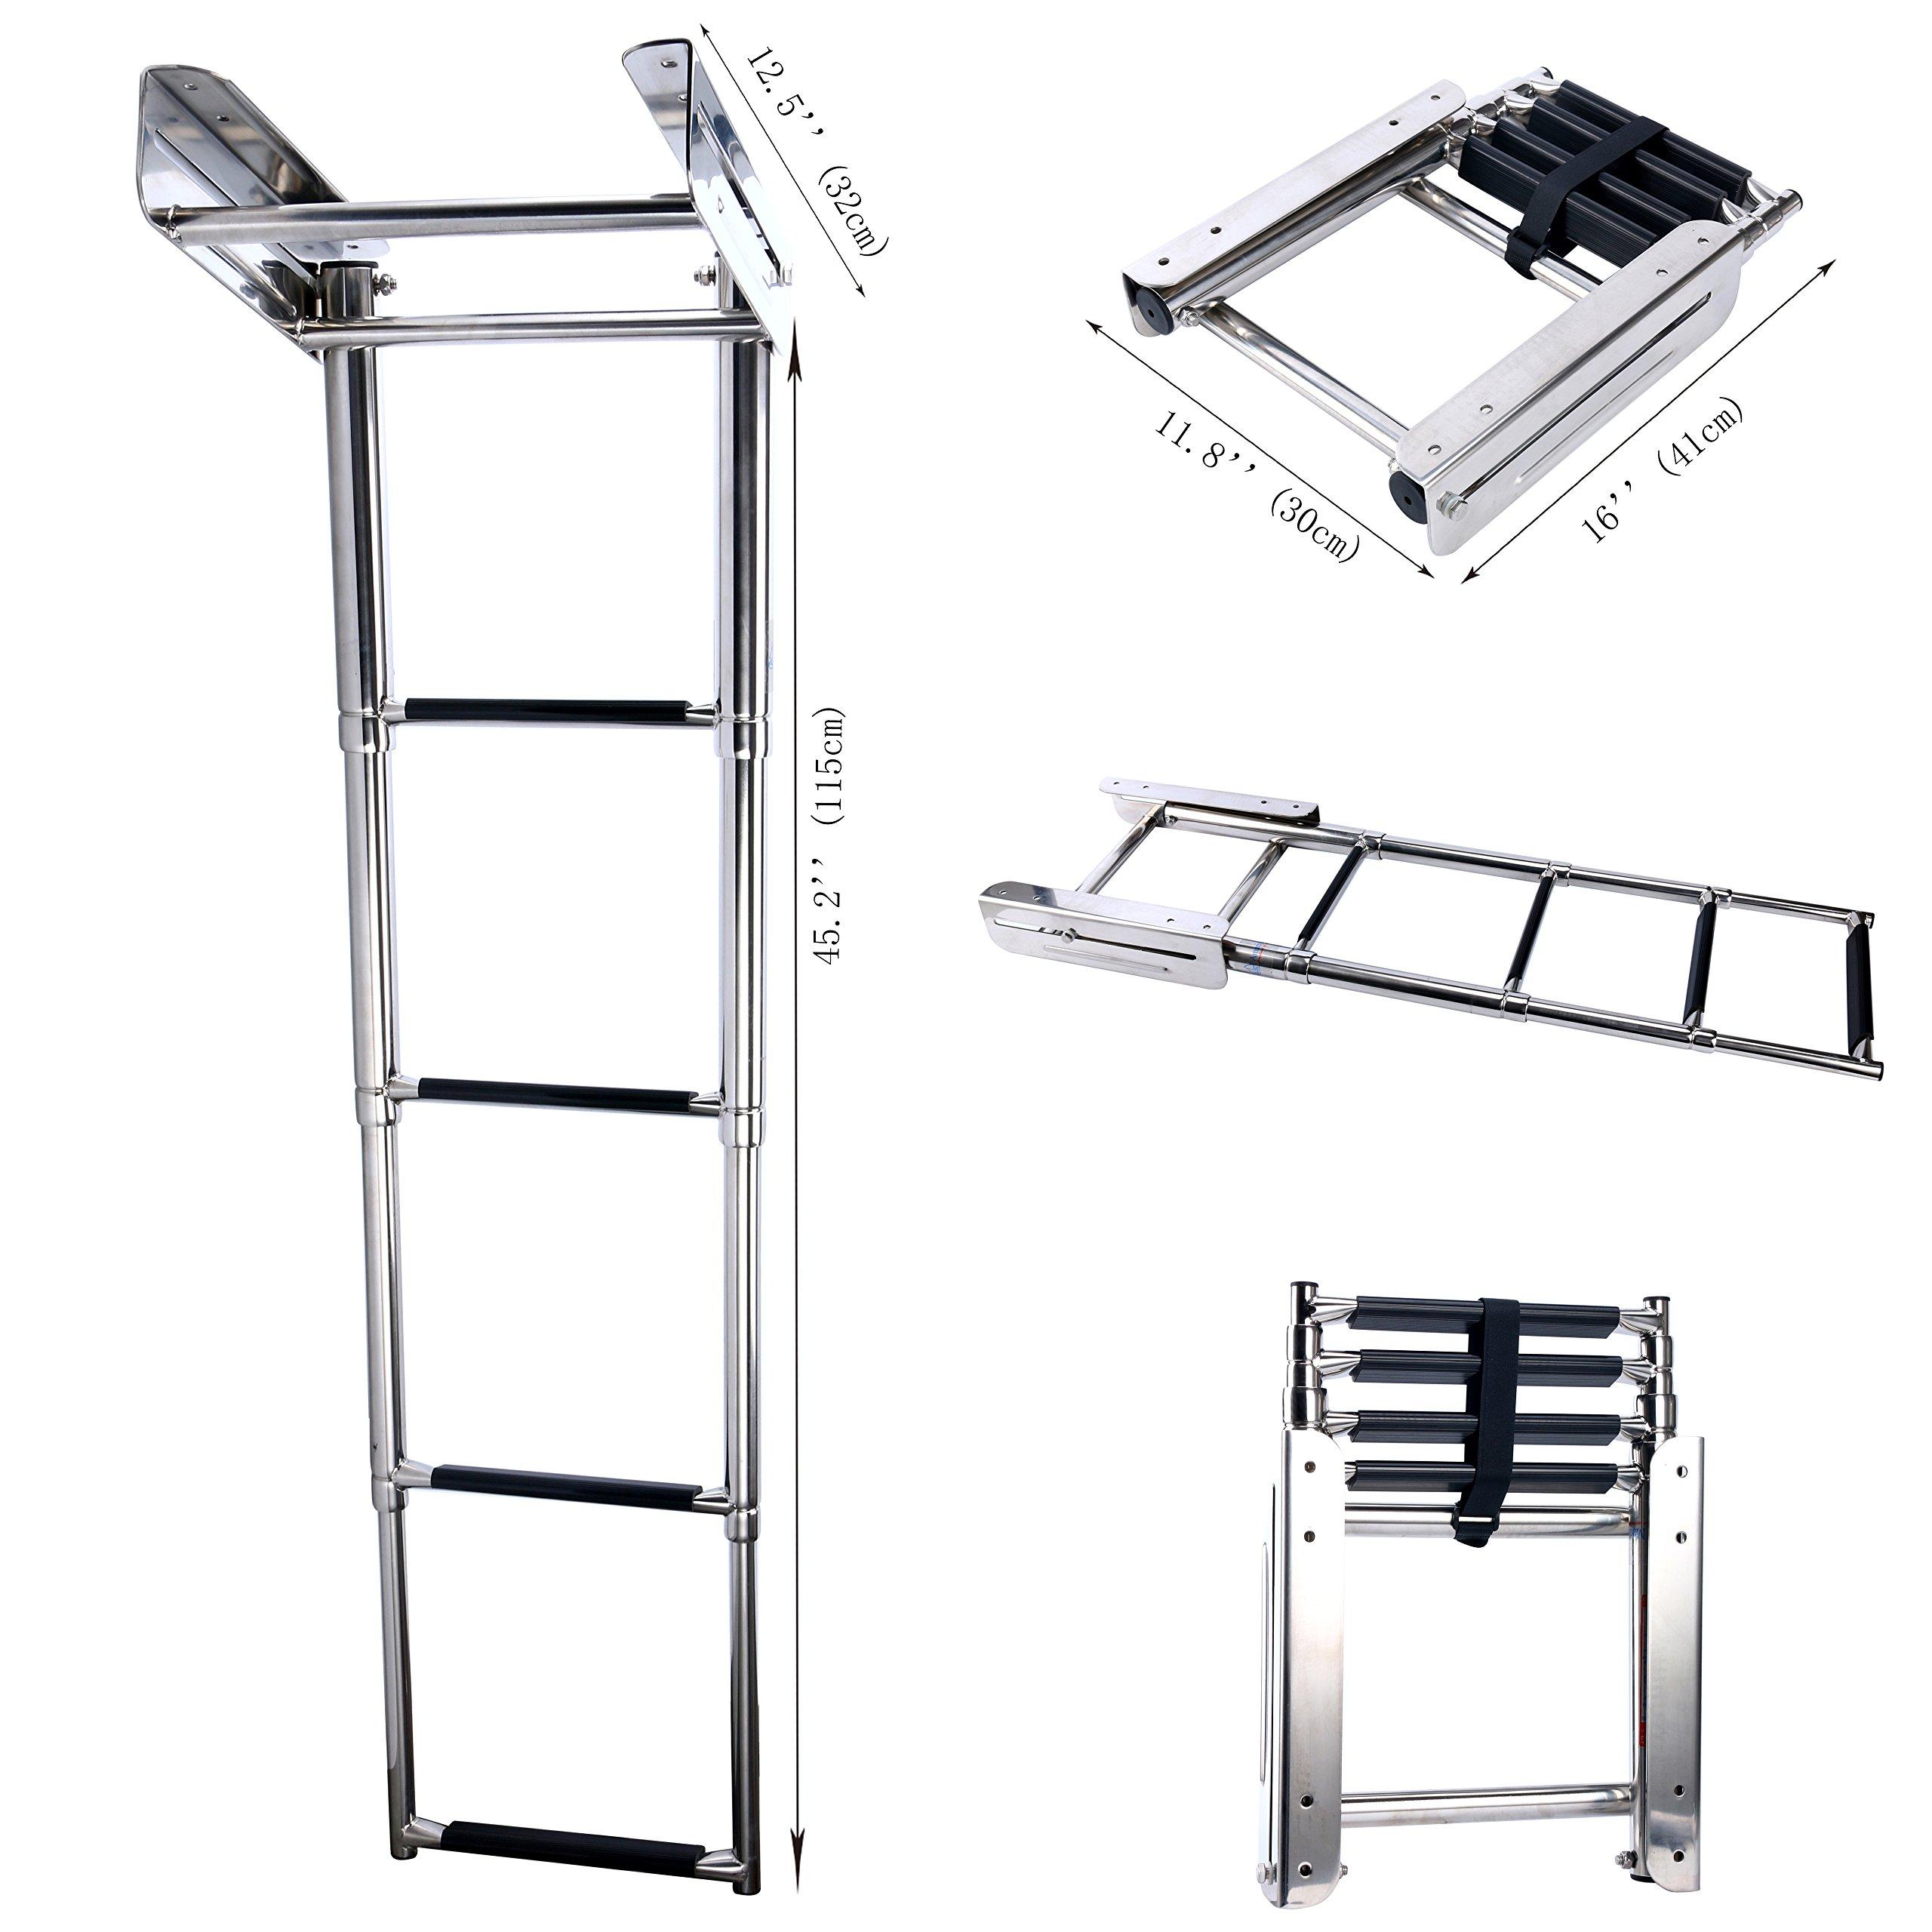 Amarine-made 4-step Stainless Steel Under Platform Slide Mount Boat Boarding Telescoping Ladder - FBA (A) by Amarine-made